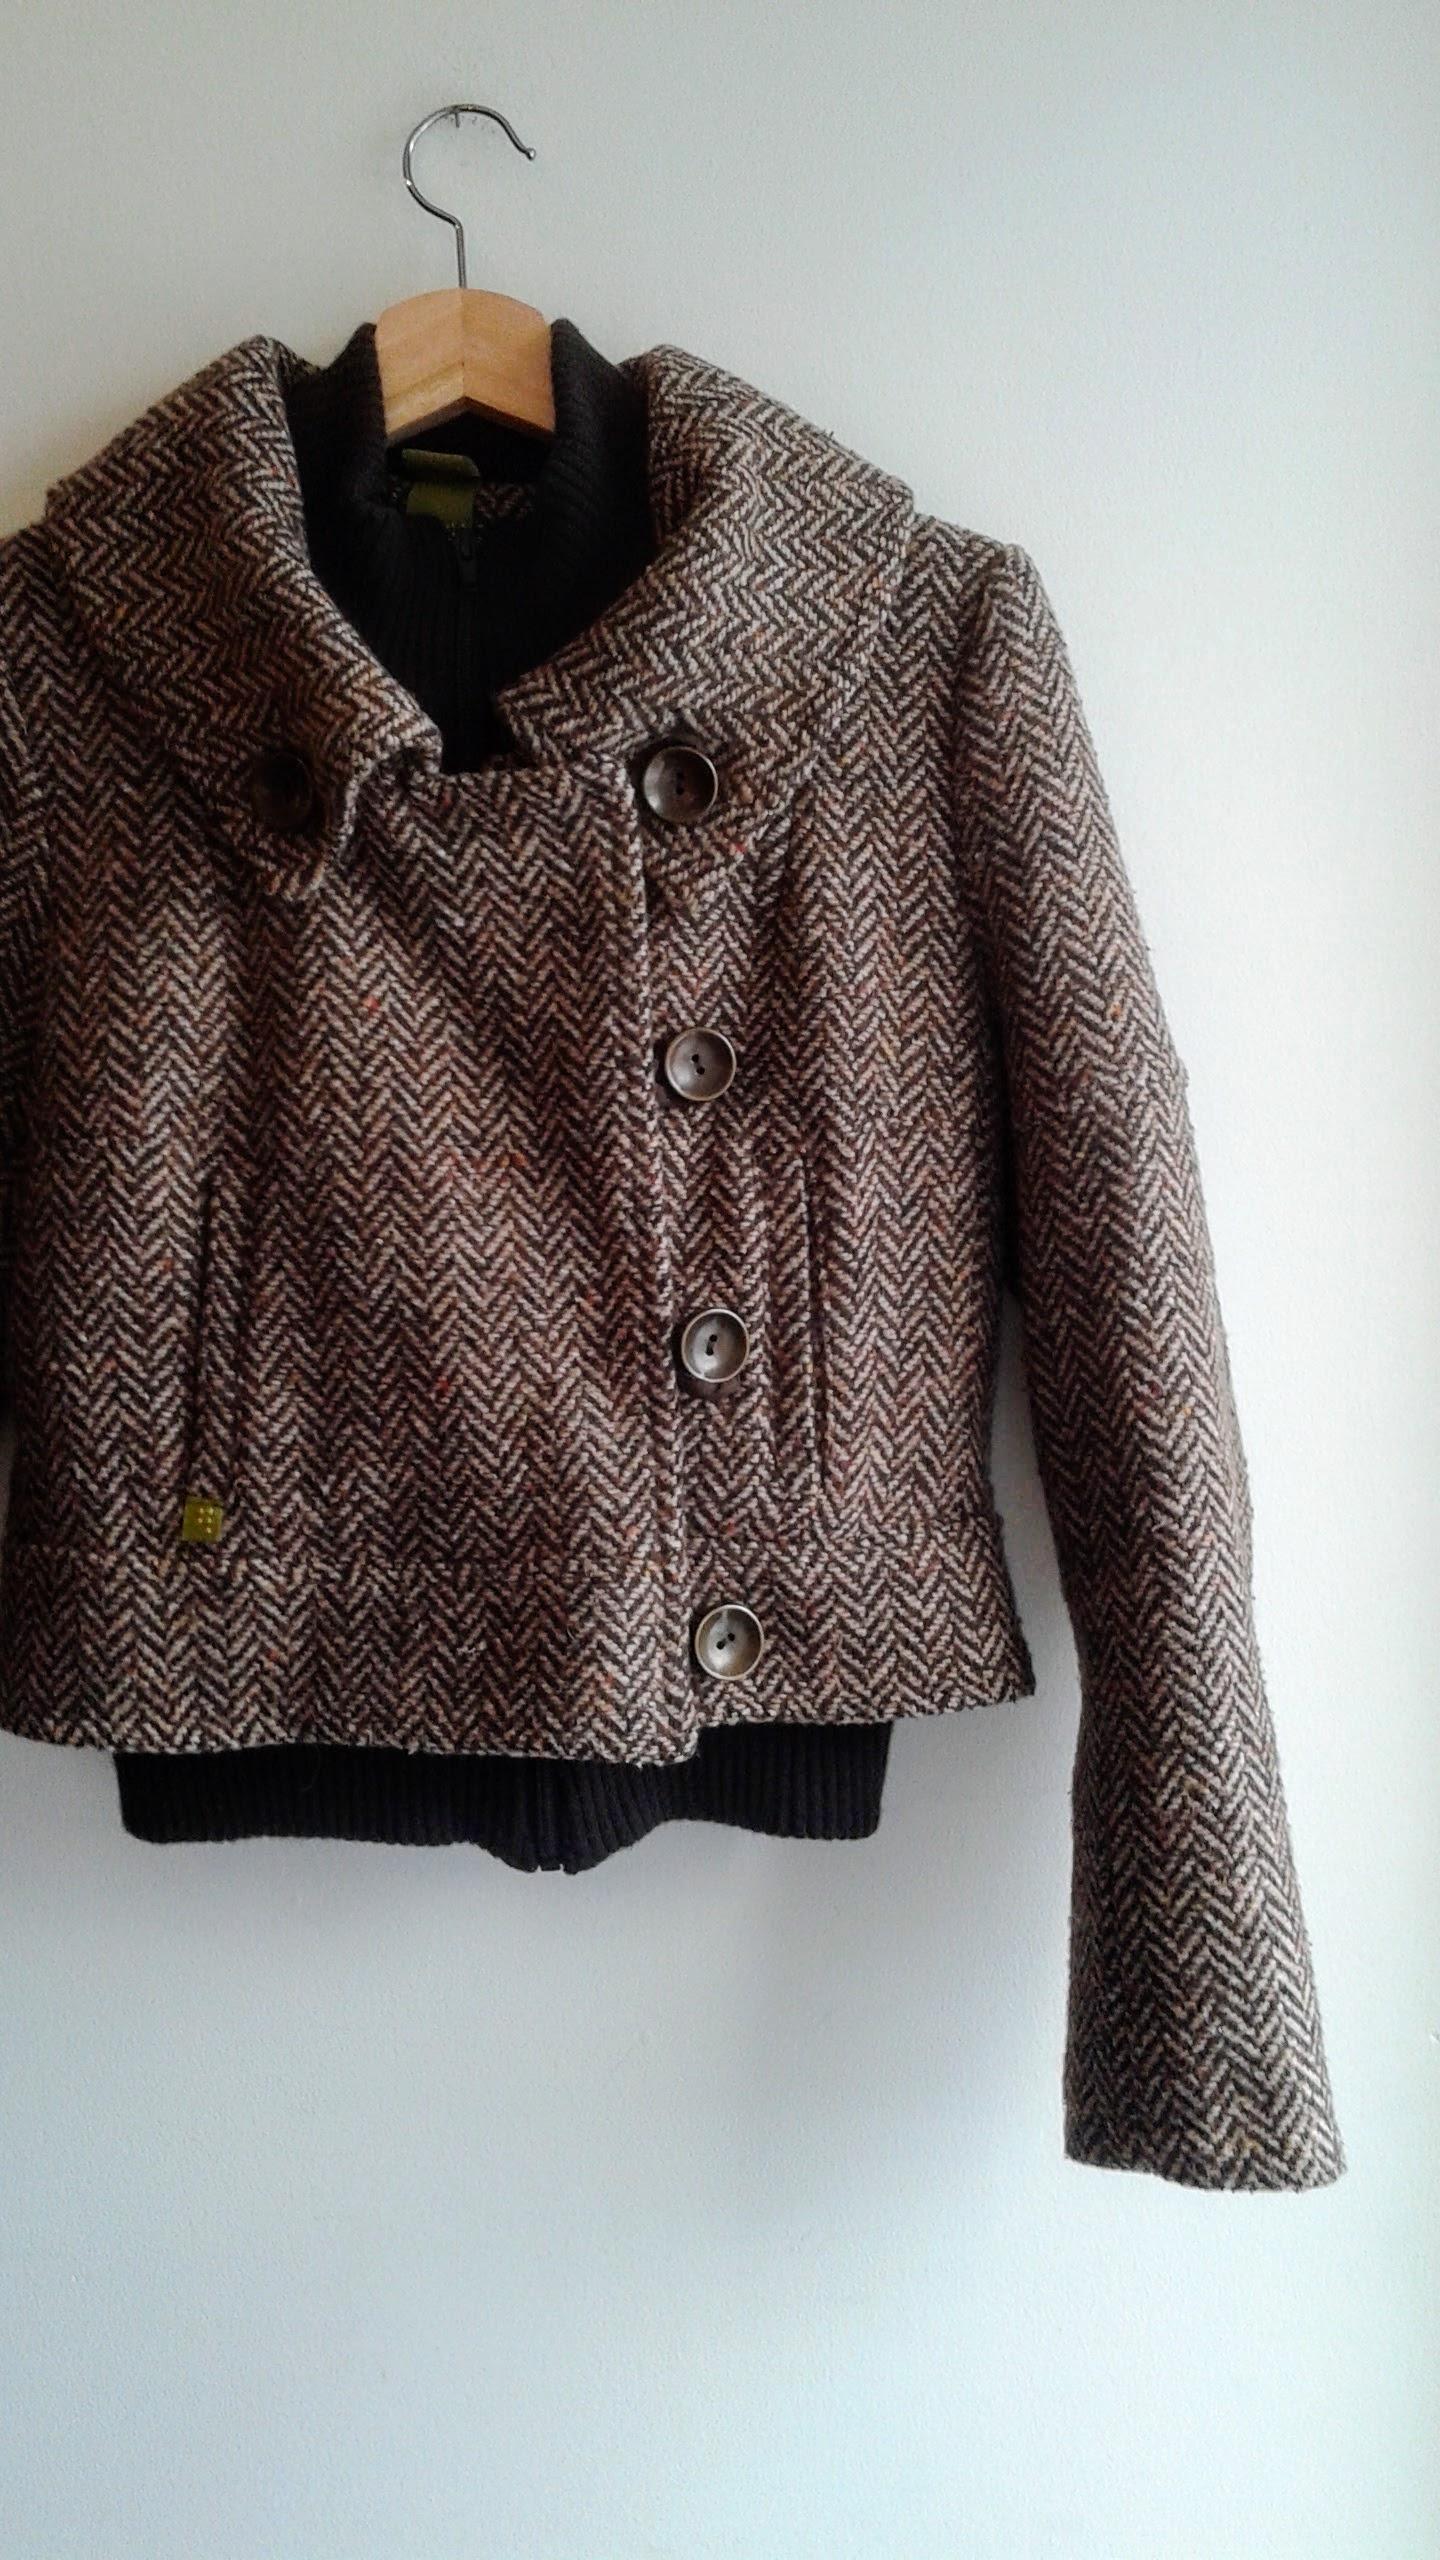 Soia & Kyo jacket; Size S, $68